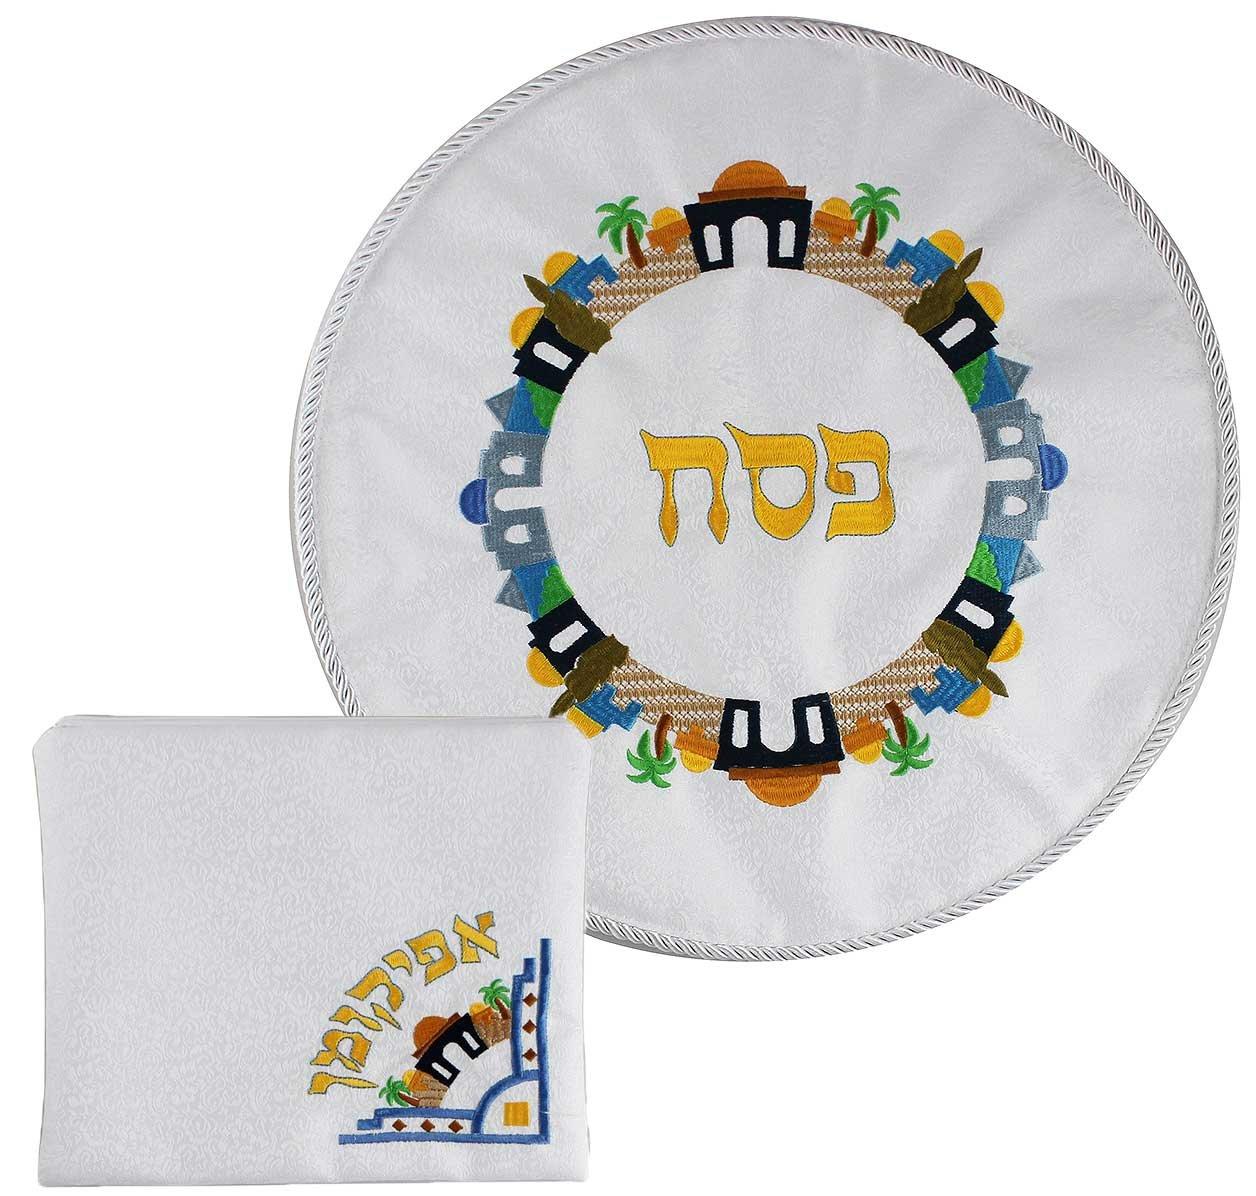 Zion Judaica Embroidered Brocade Beautiful Jerusalem Matzah Cover and Afikoman Bag Option (Set)